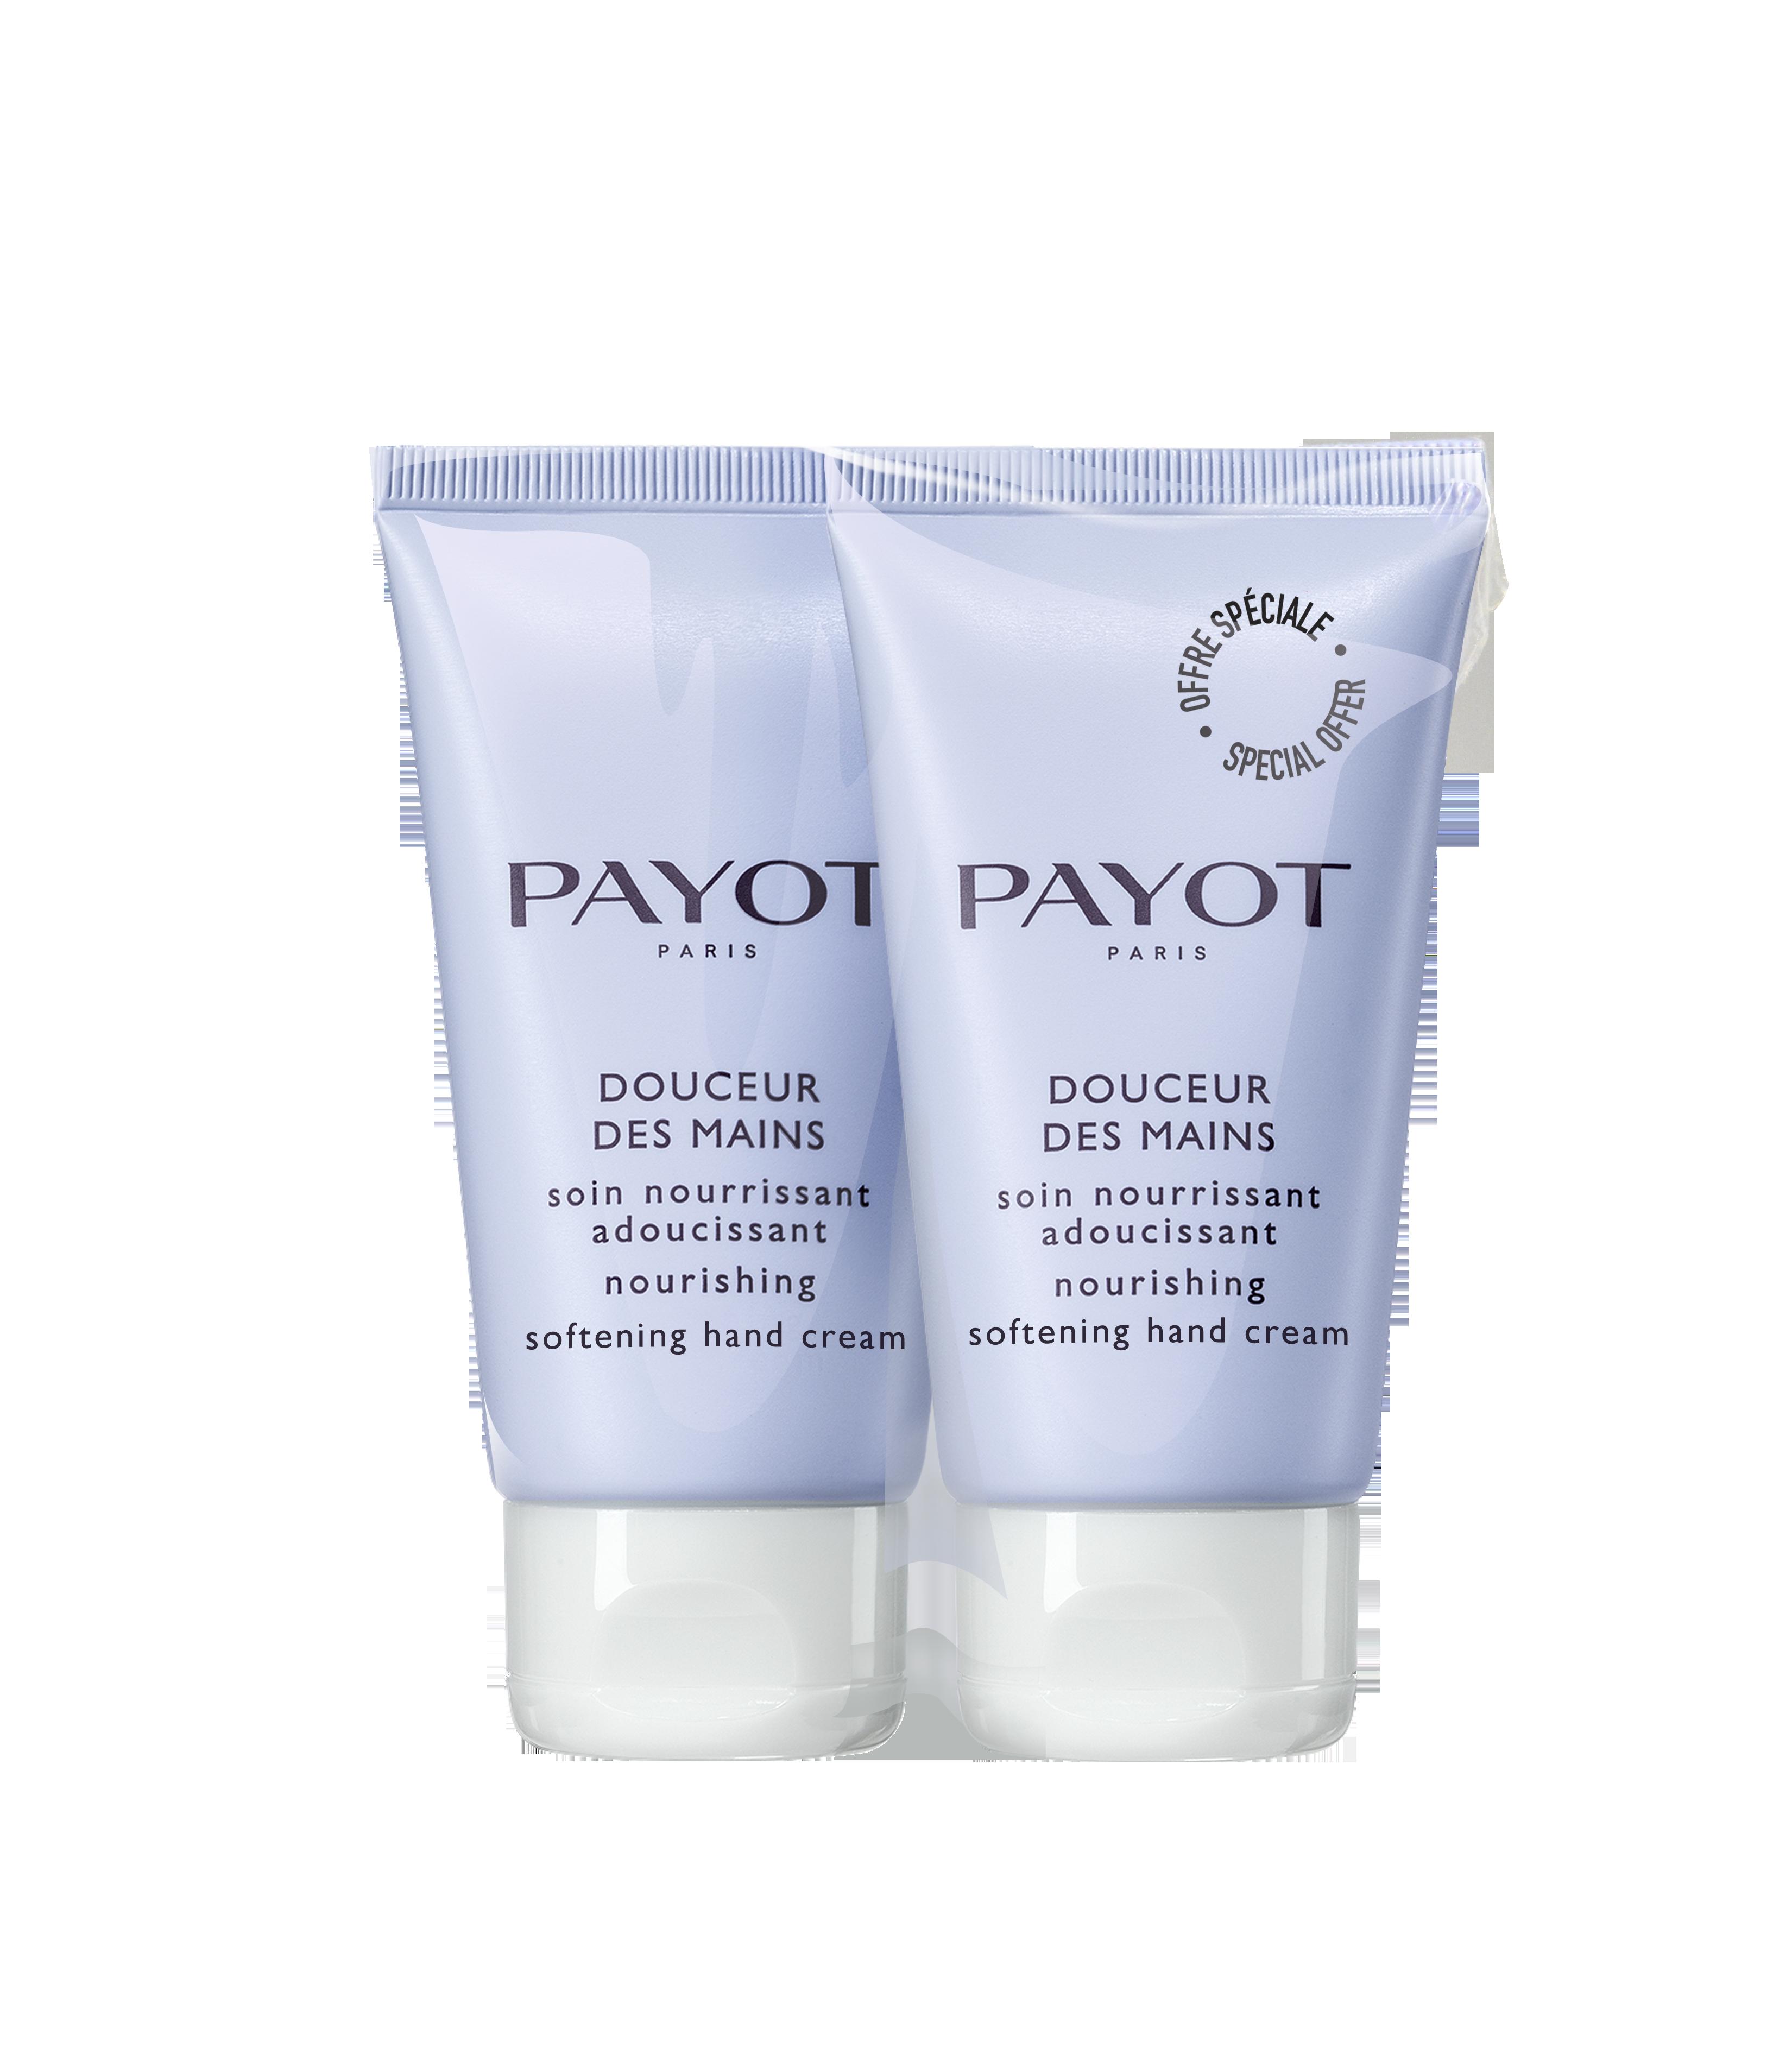 PAYOT Набор по уходу за руками, промо (питательный крем для рук 50 мл х 2 шт.) / Payot Corps